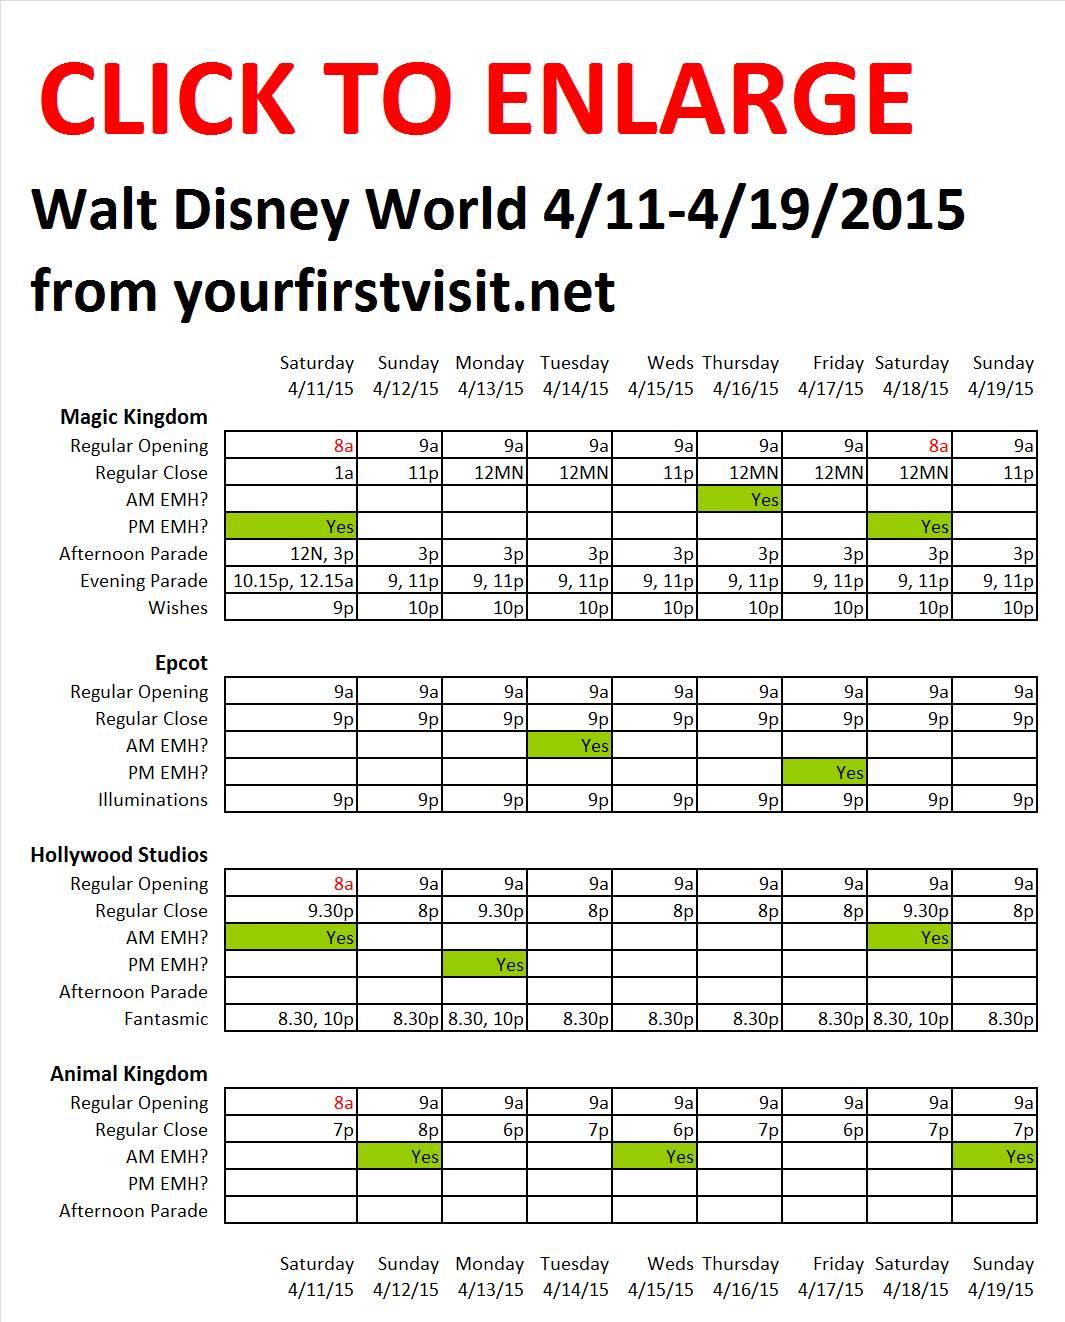 Disney World 4-11 to 4-19-2015 from yourfirstvisit.net